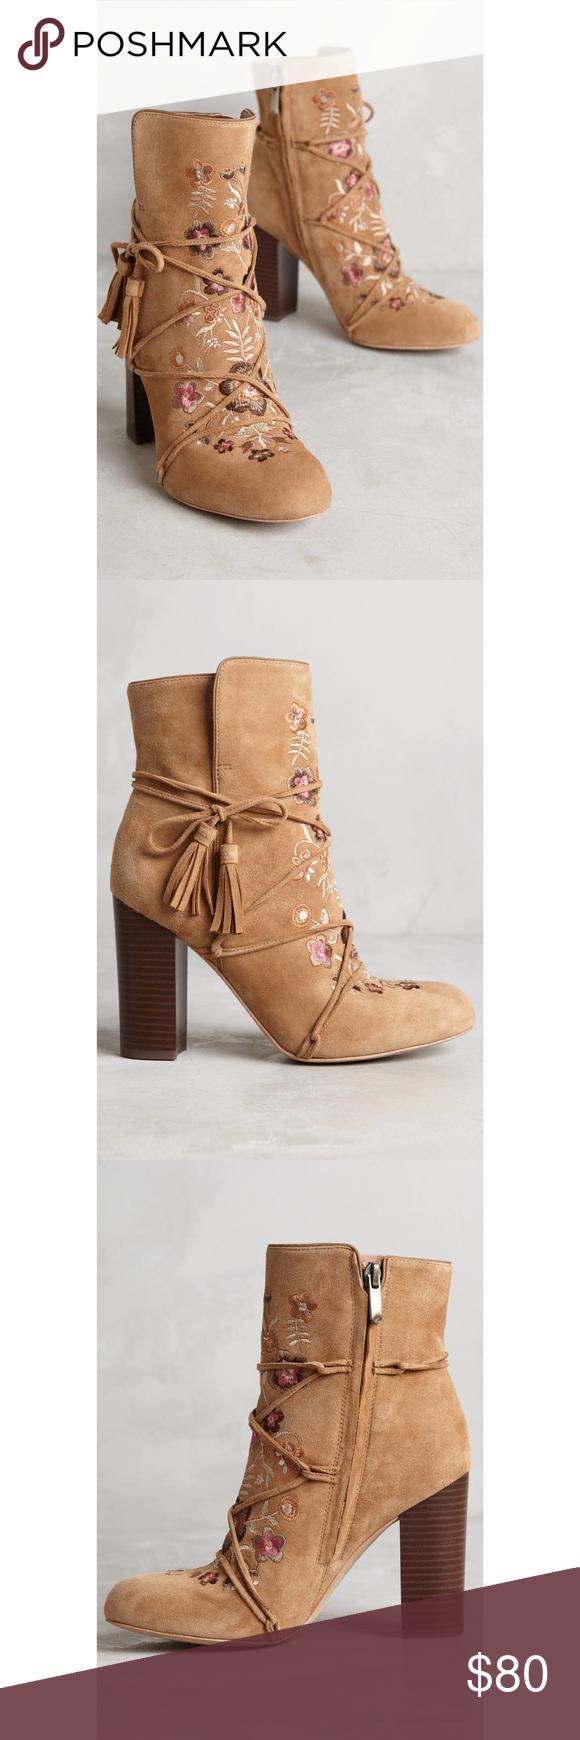 c8317bb50 Sam Edelman Winnie Embroidered Ankle Boot New